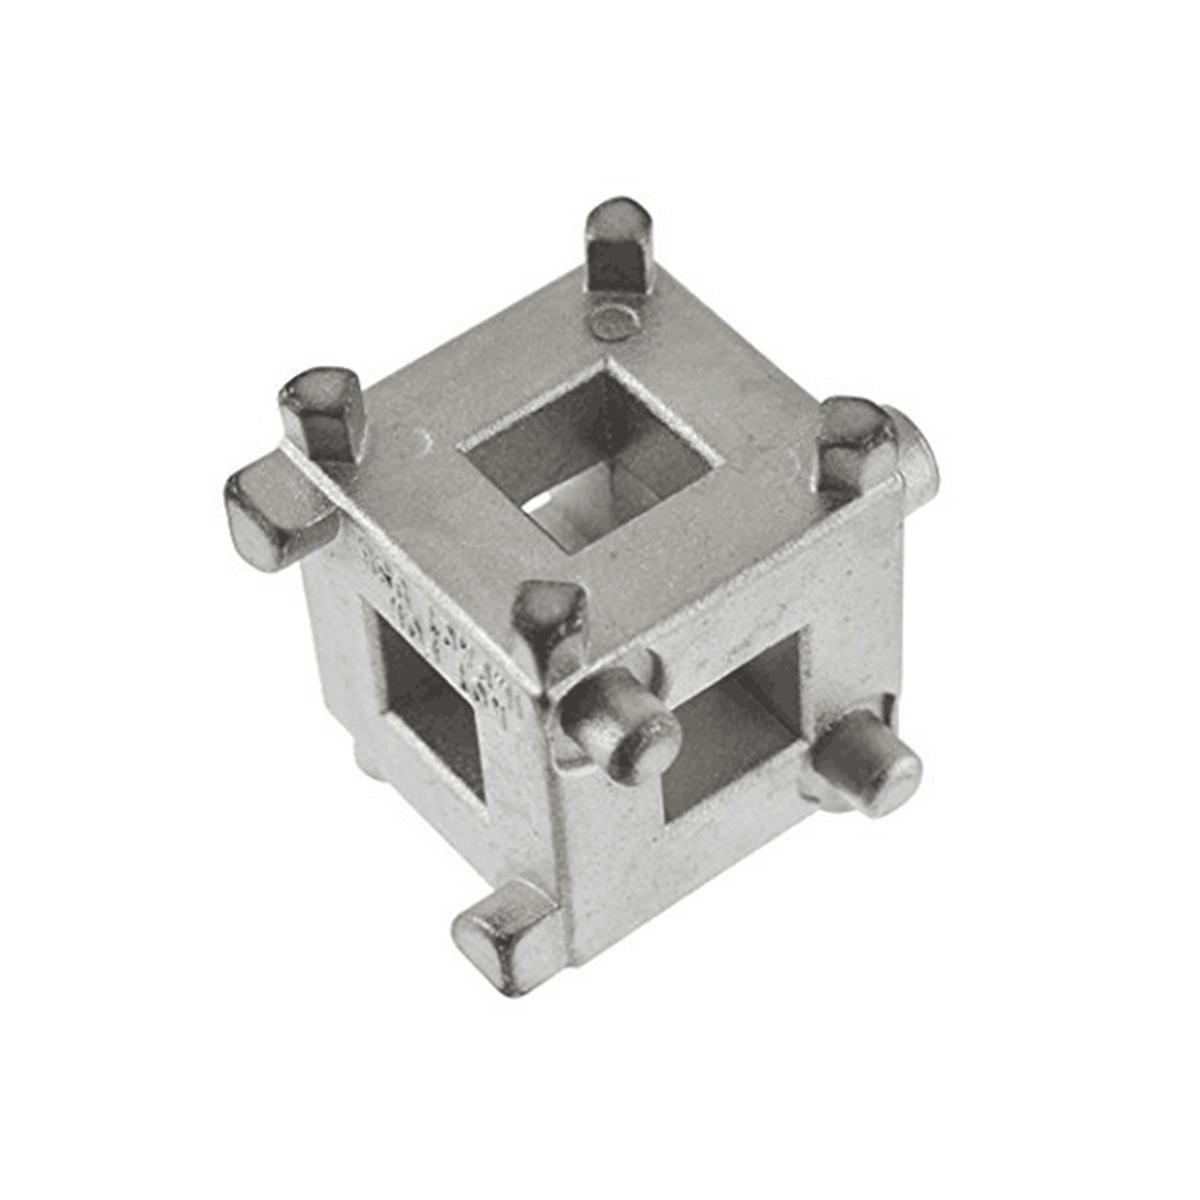 REAR BRAKE DISC Piston Caliper 3/8